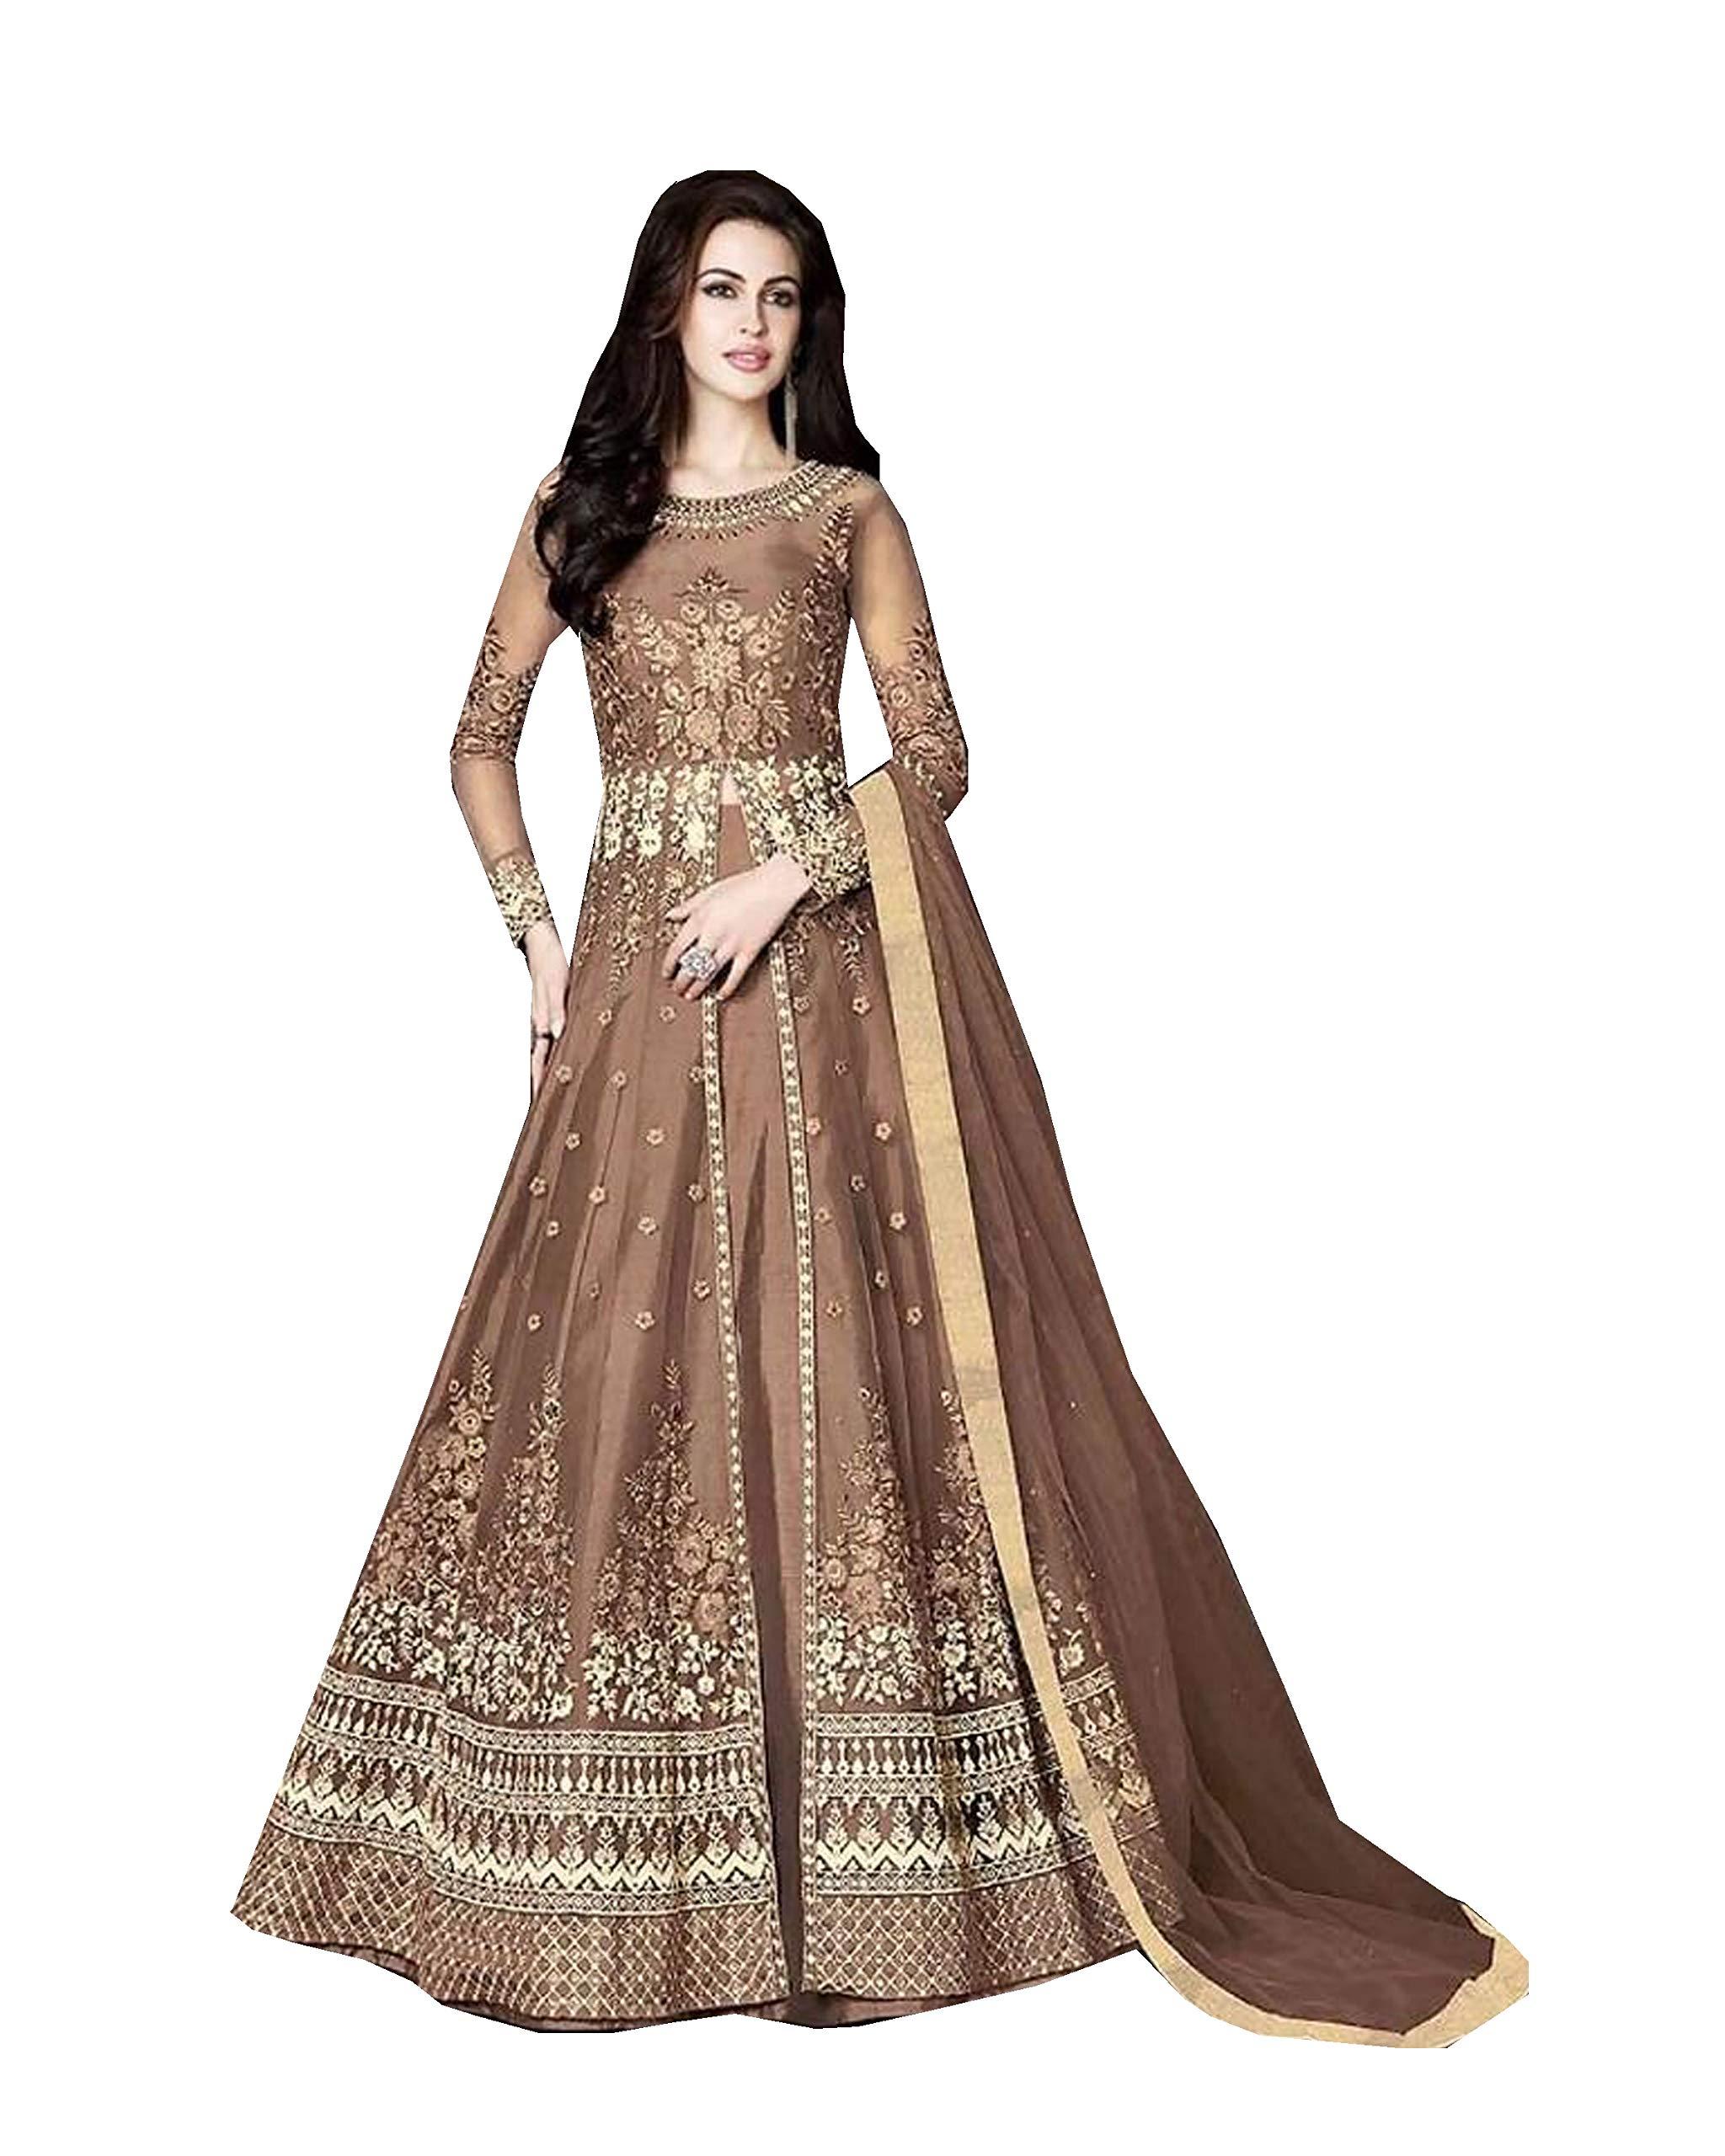 Delisa Indian/Pakistani Bollywood Party Wear Long Anarkali Gown for Womens Razzi 1002 (Light Orange, SMALL-38)